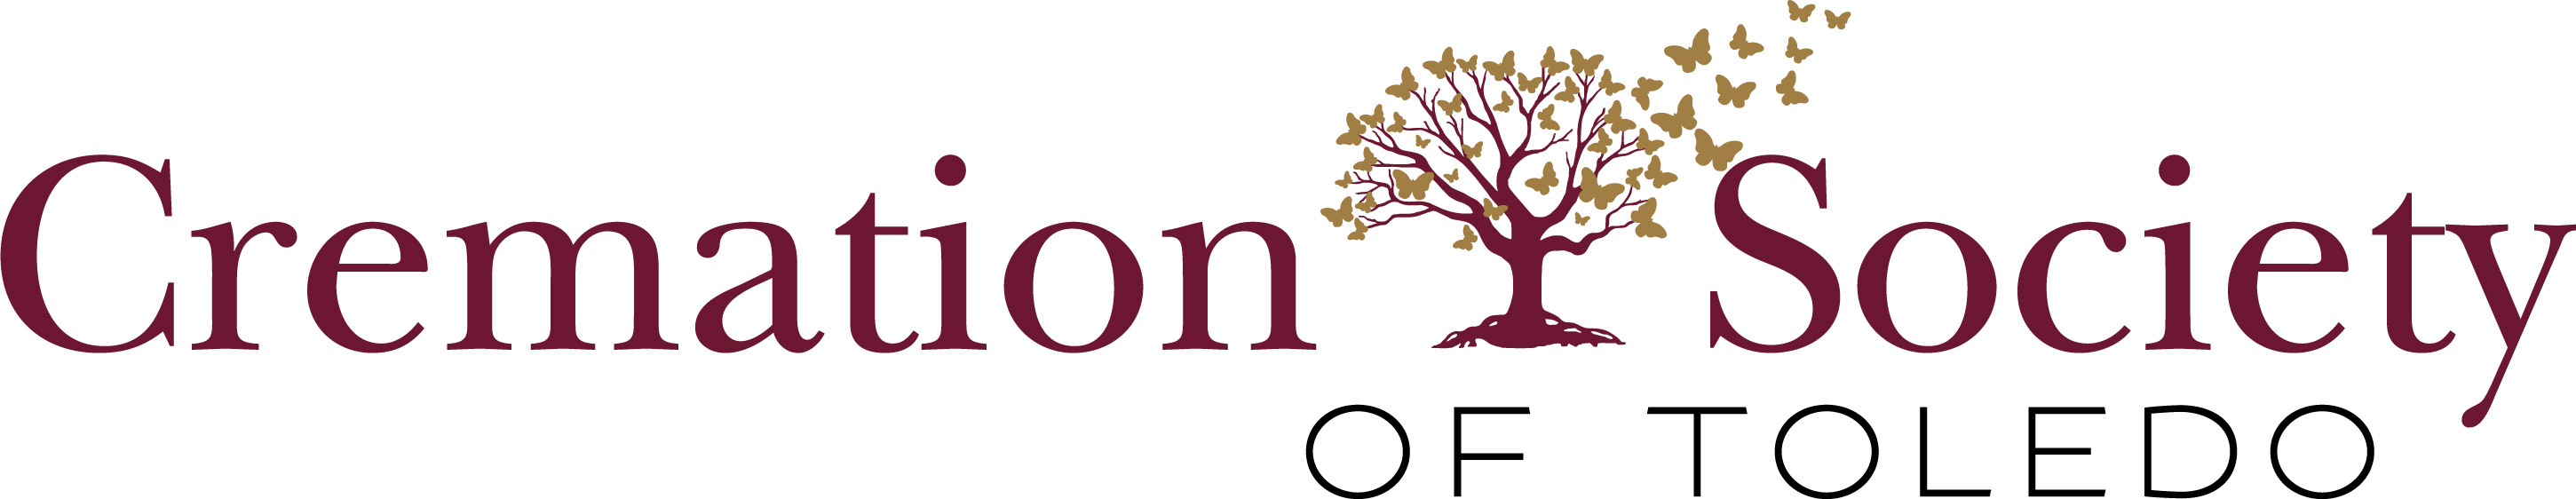 Cremation Society of Toledo Logo